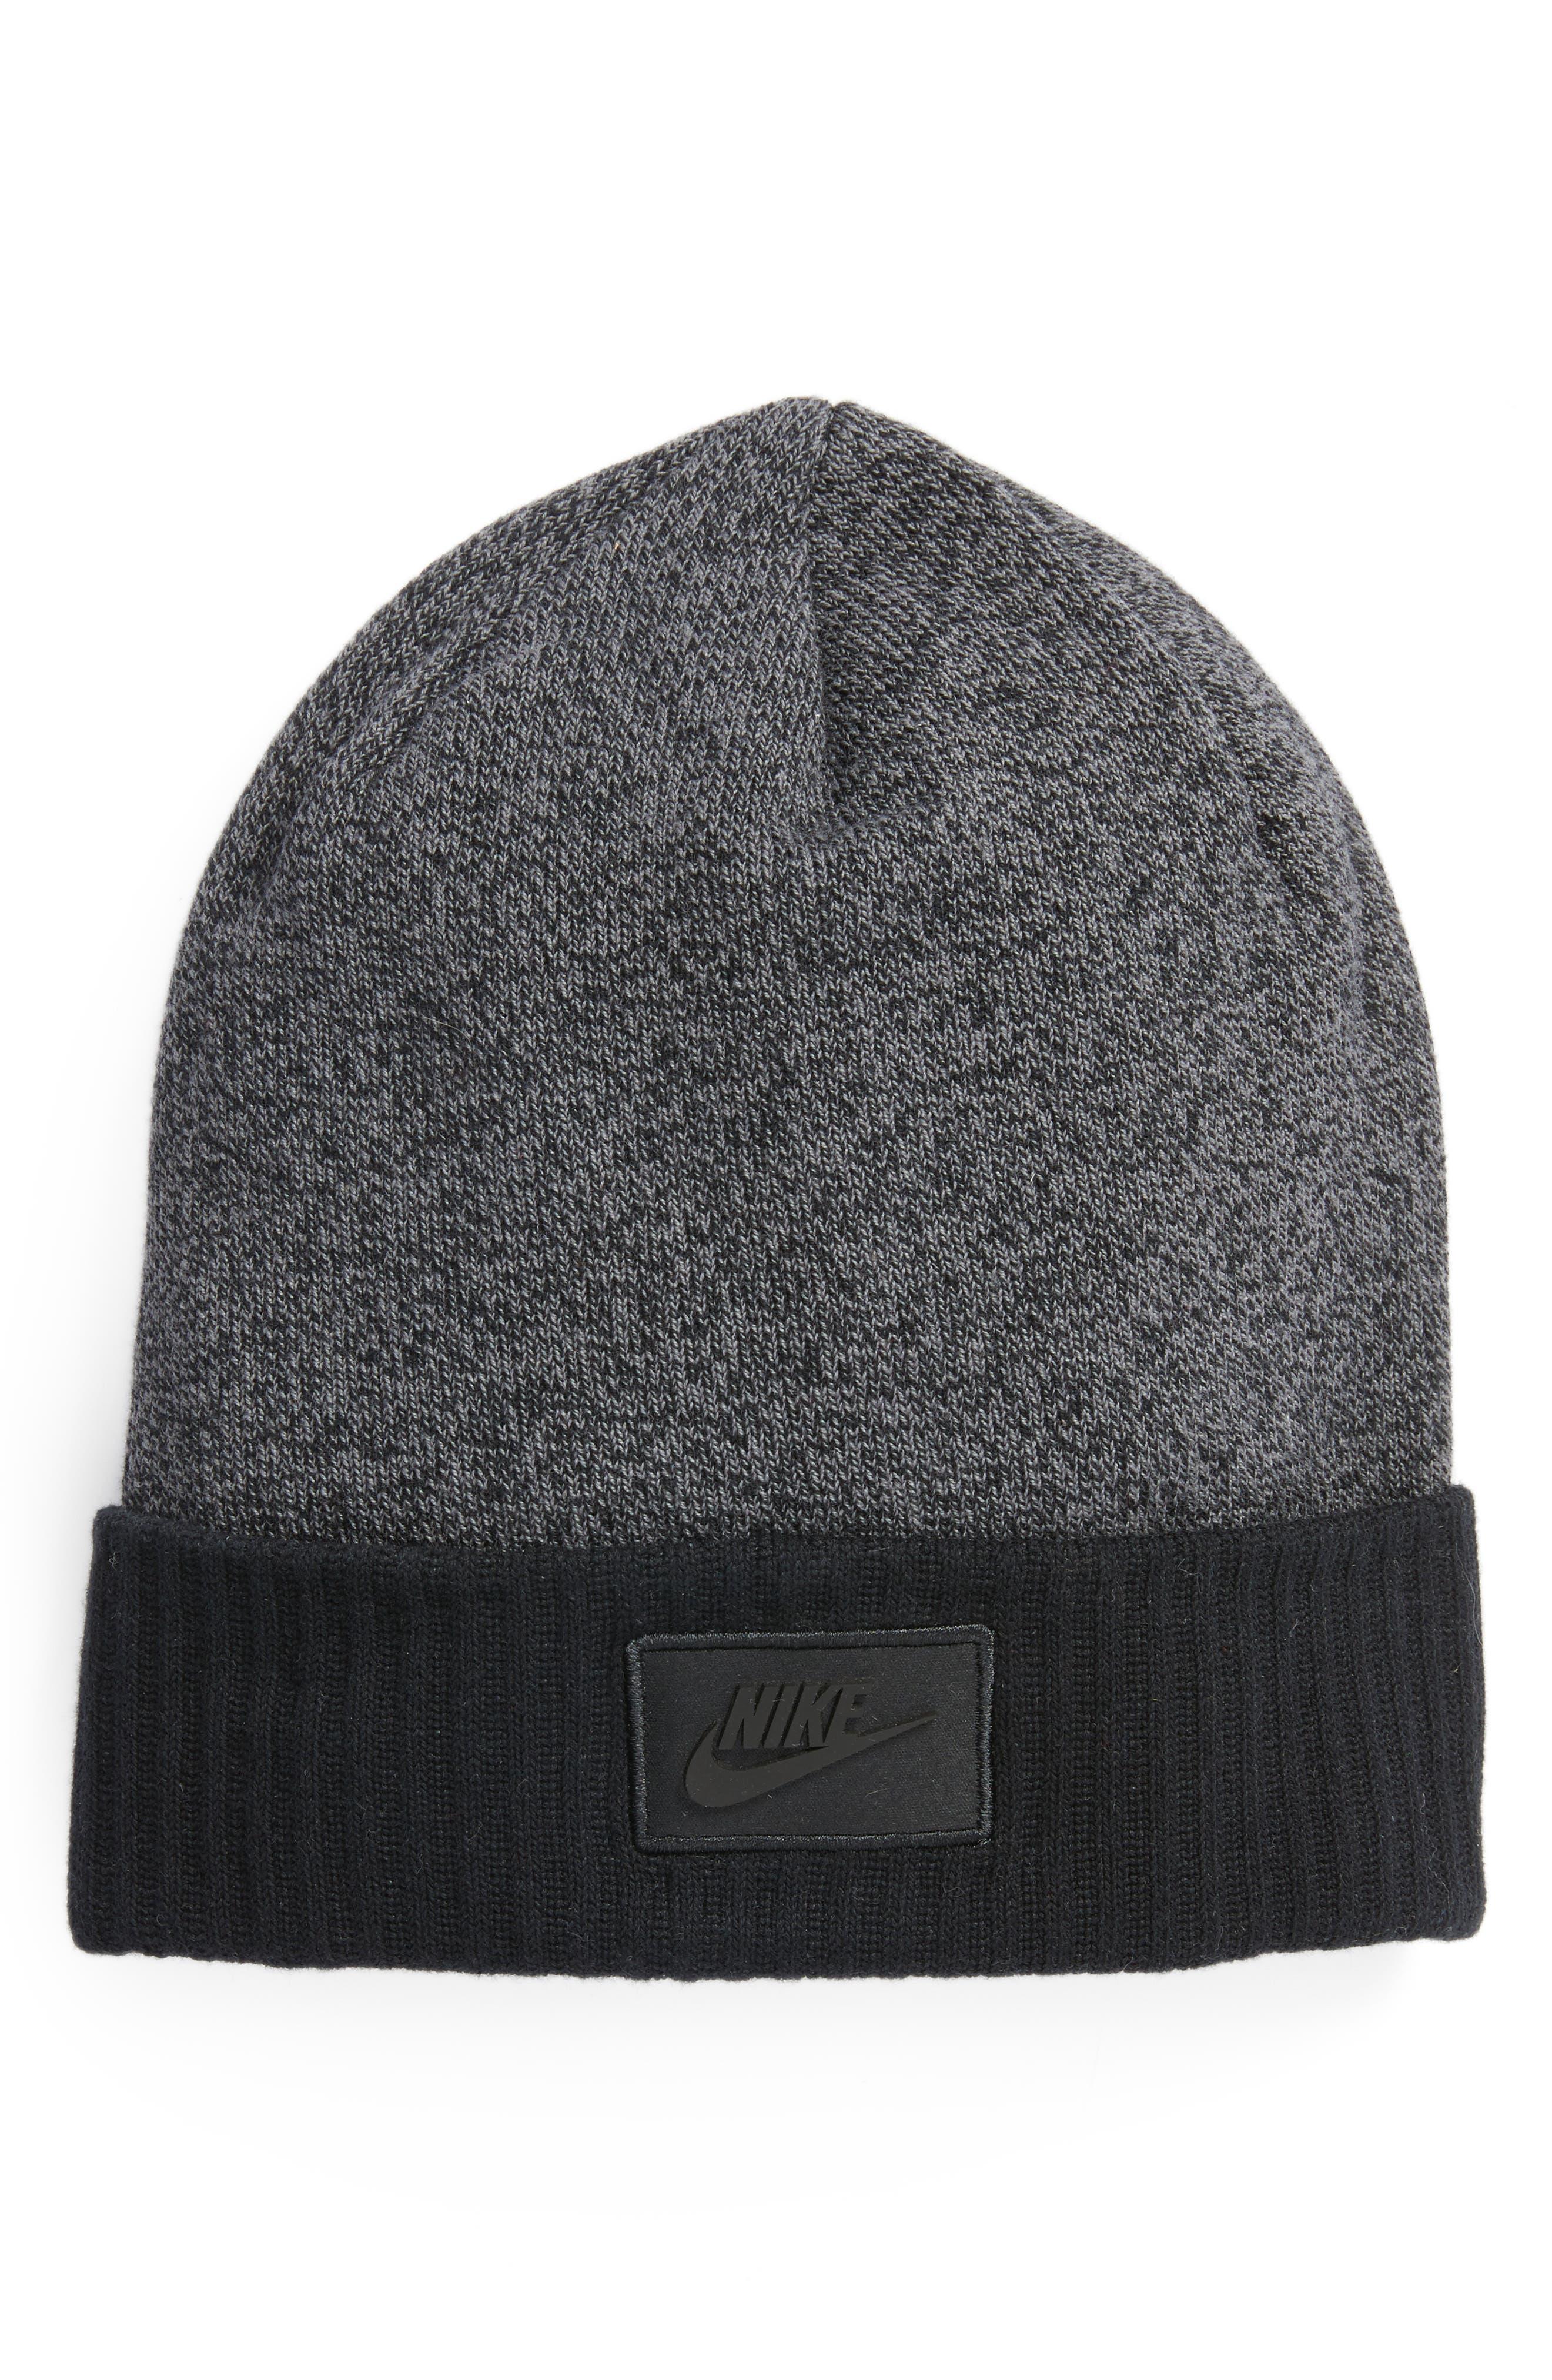 Nike Knit Beanie